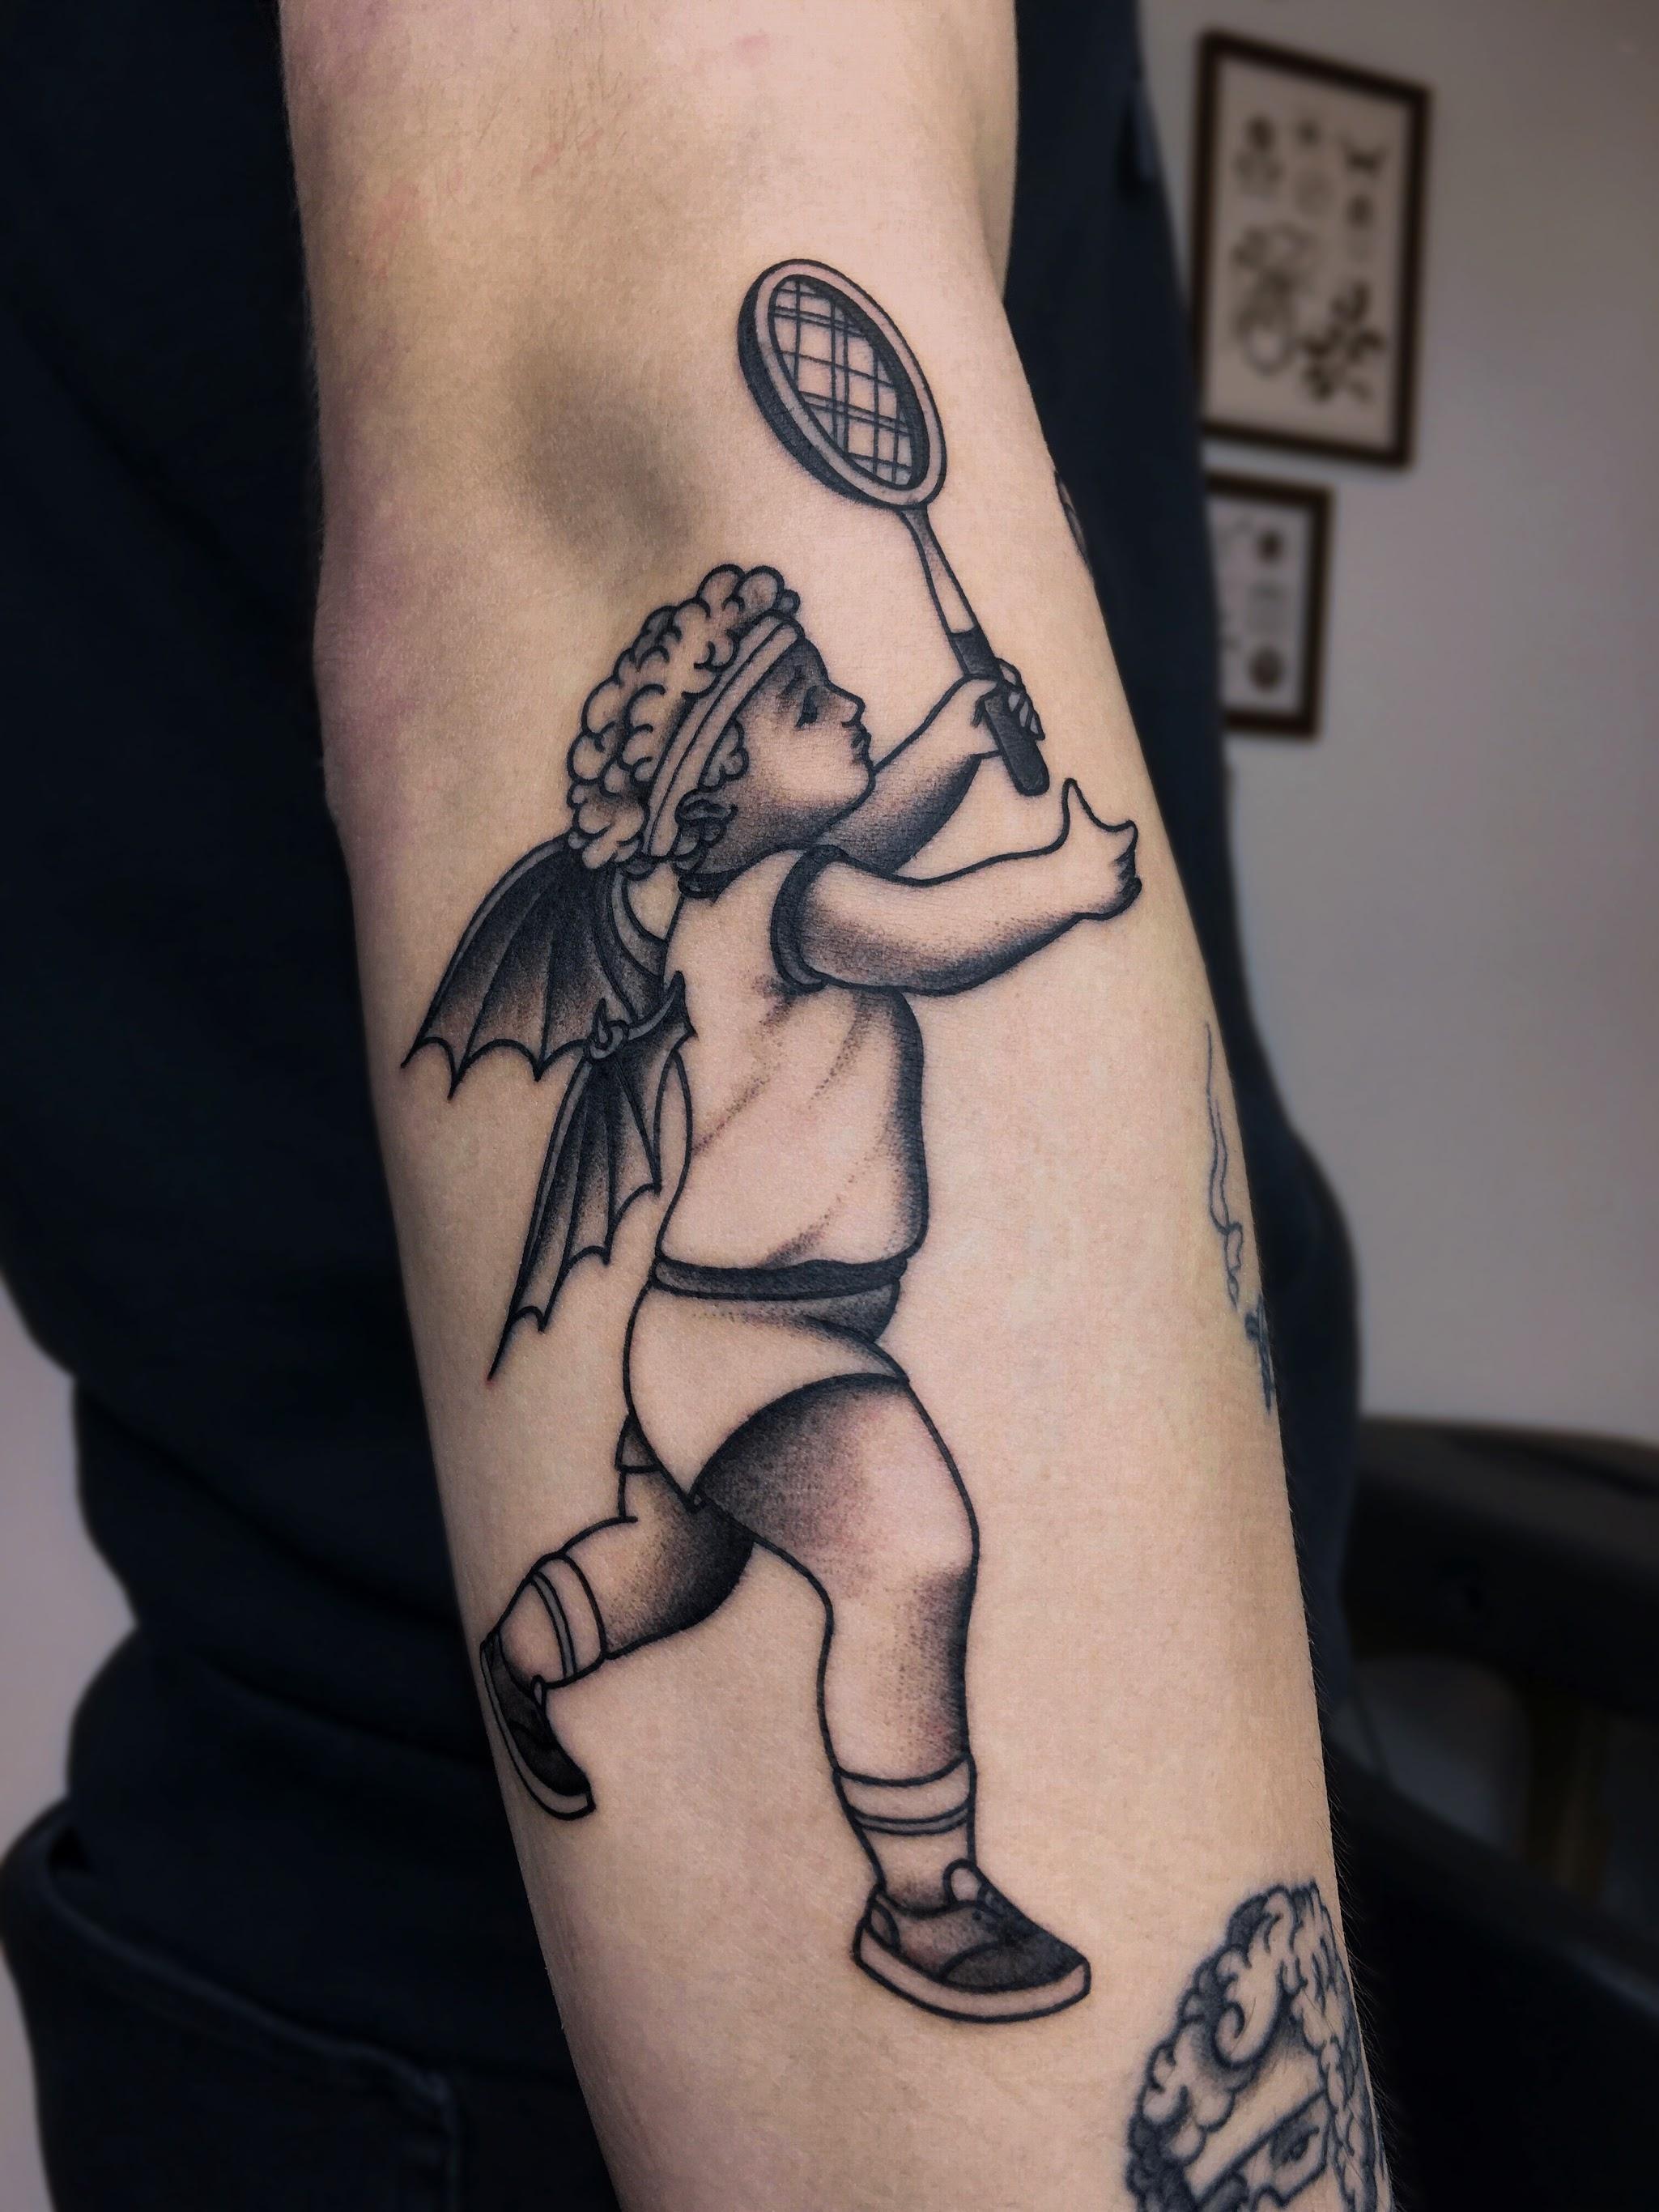 Inksearch tattoo Maksim Horror